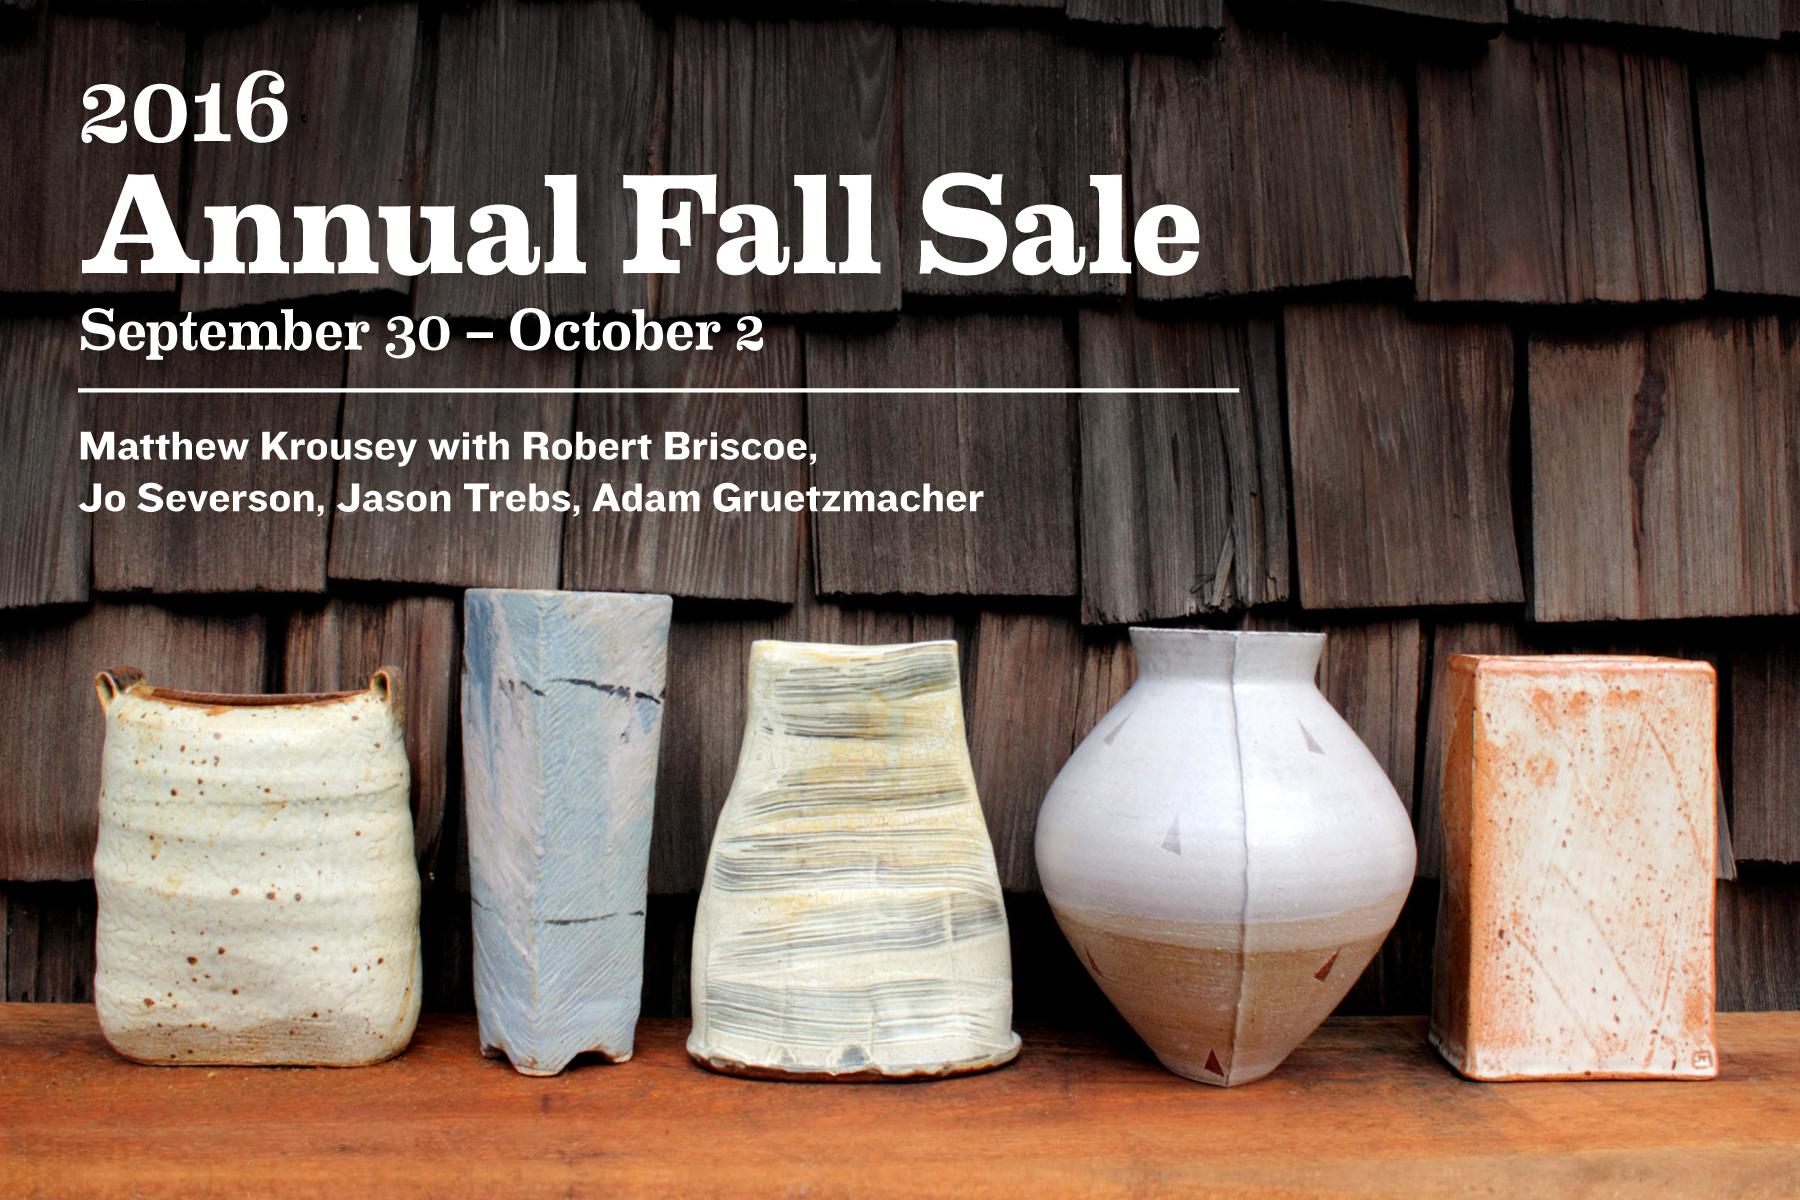 Annual Fall Sale Postcard 2016